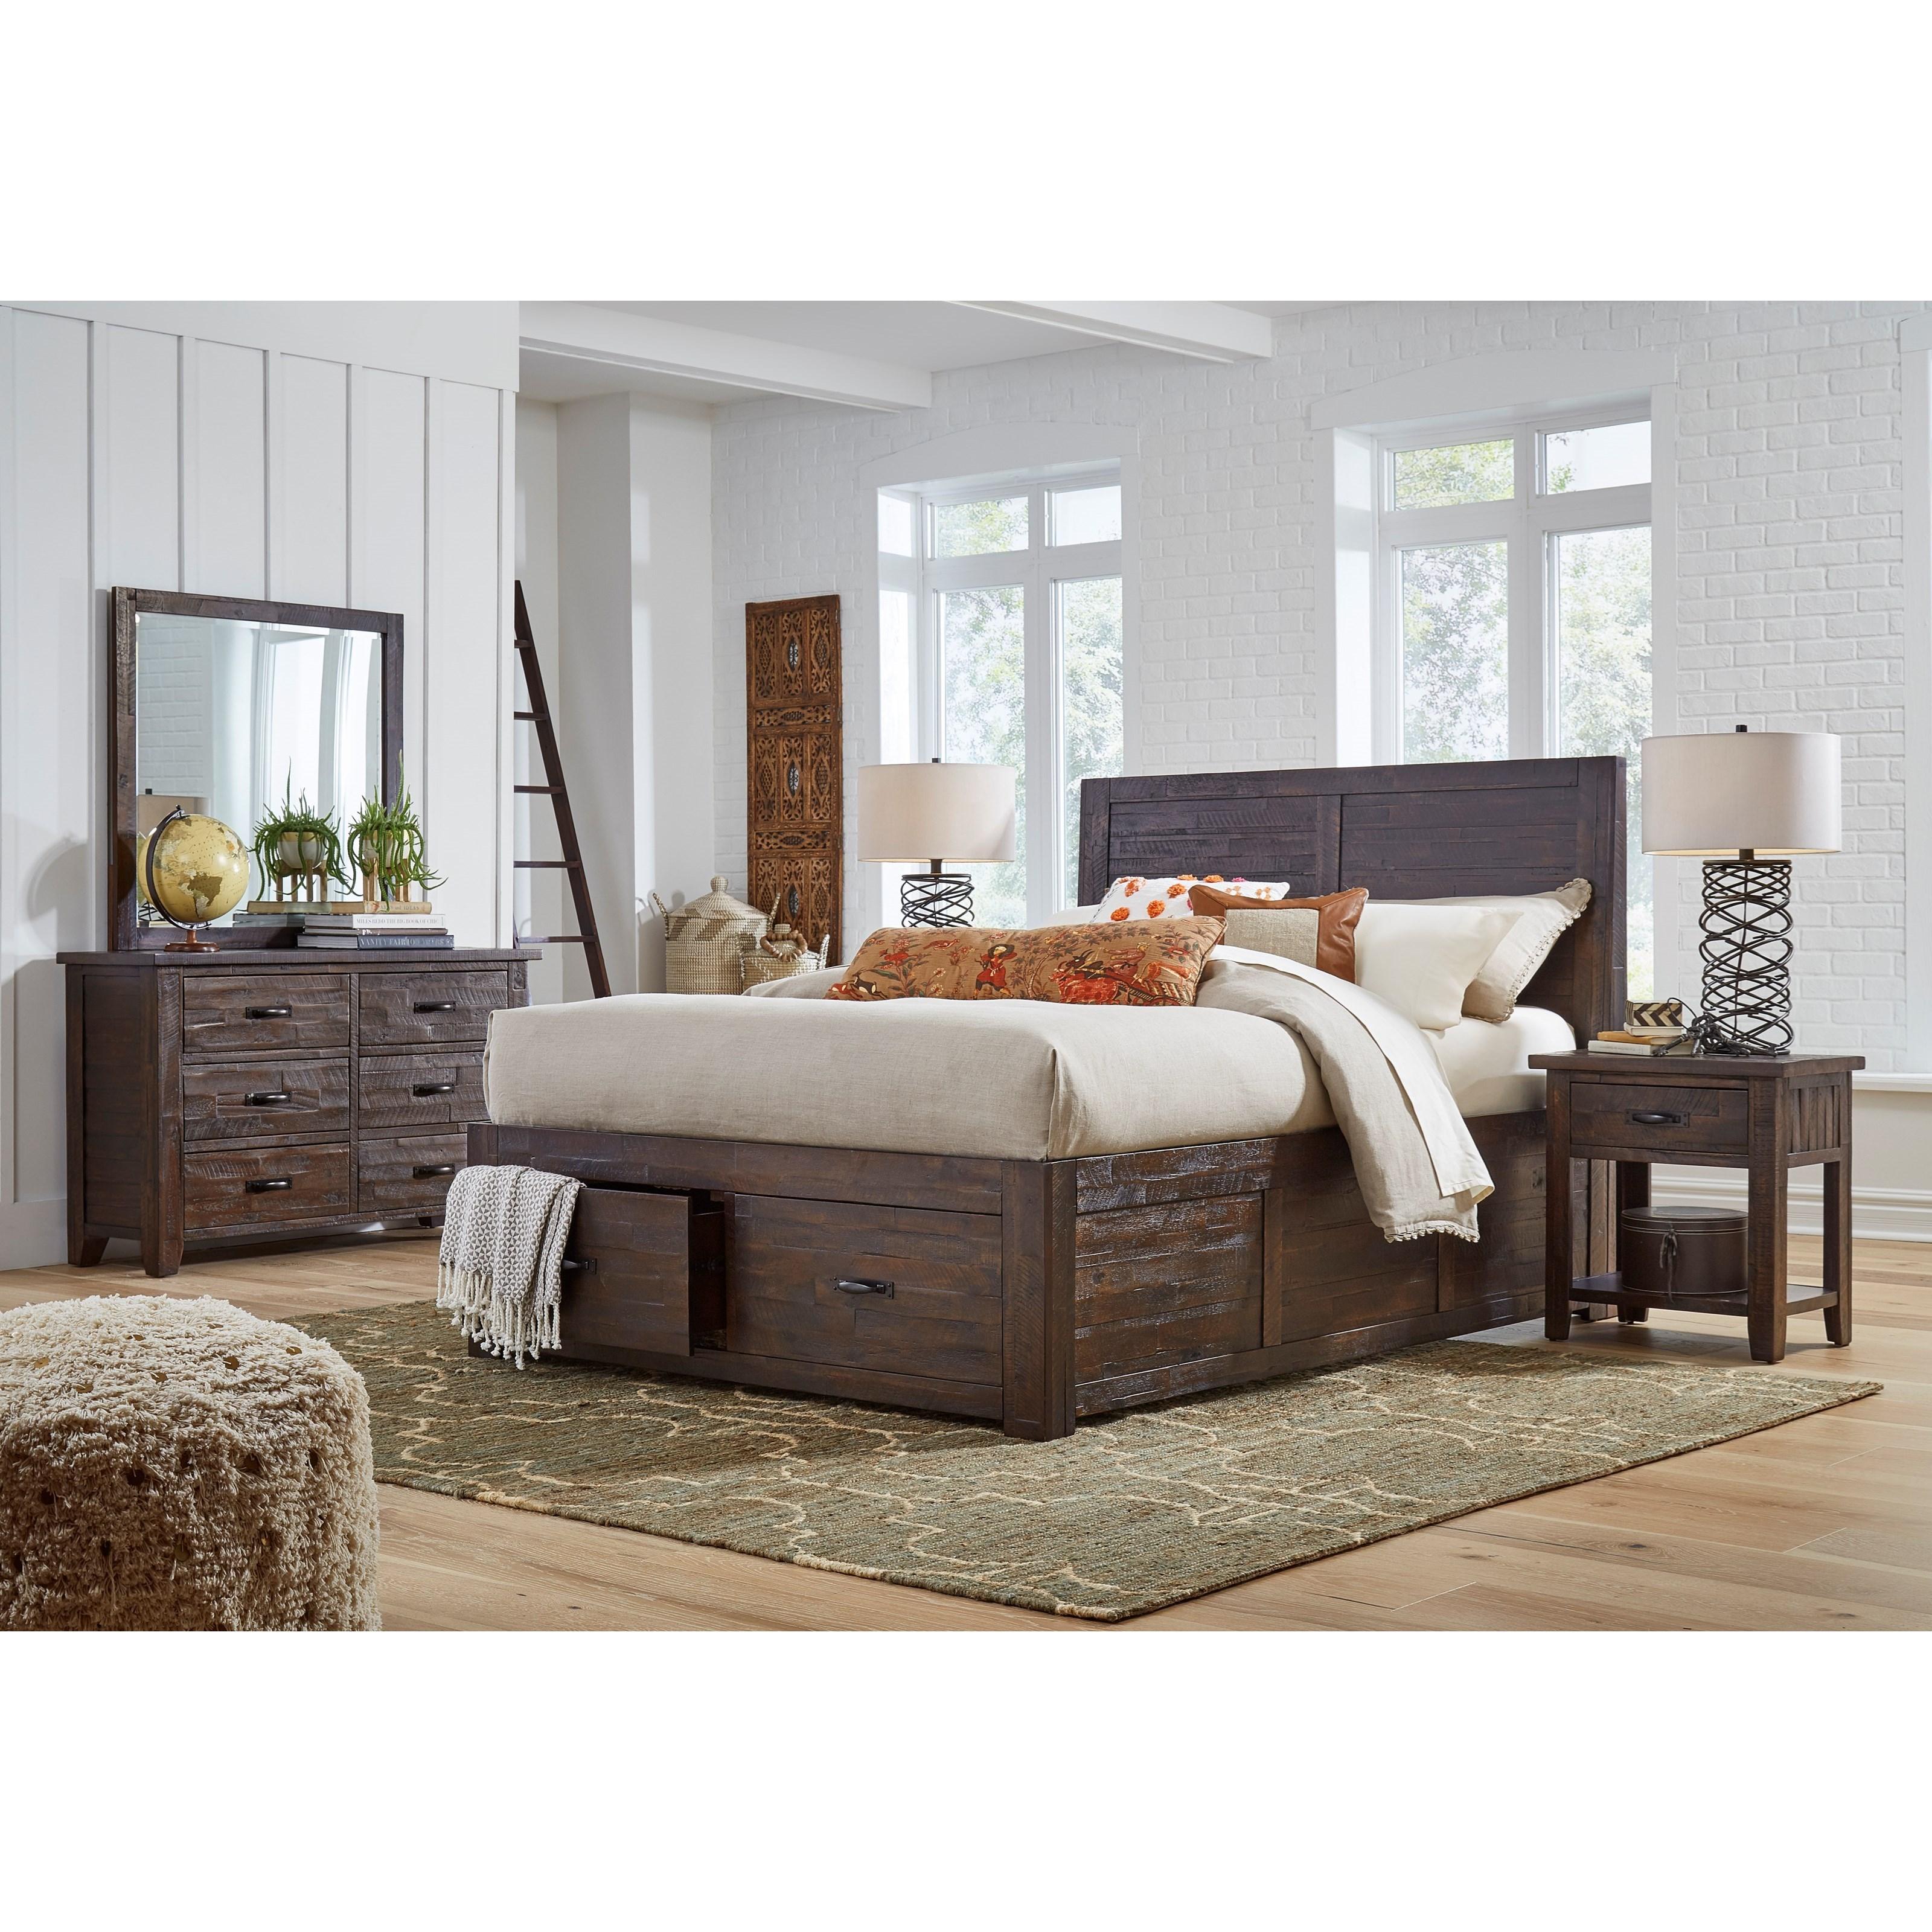 Jackson Lodge King Bedroom Group by Jofran at Stoney Creek Furniture